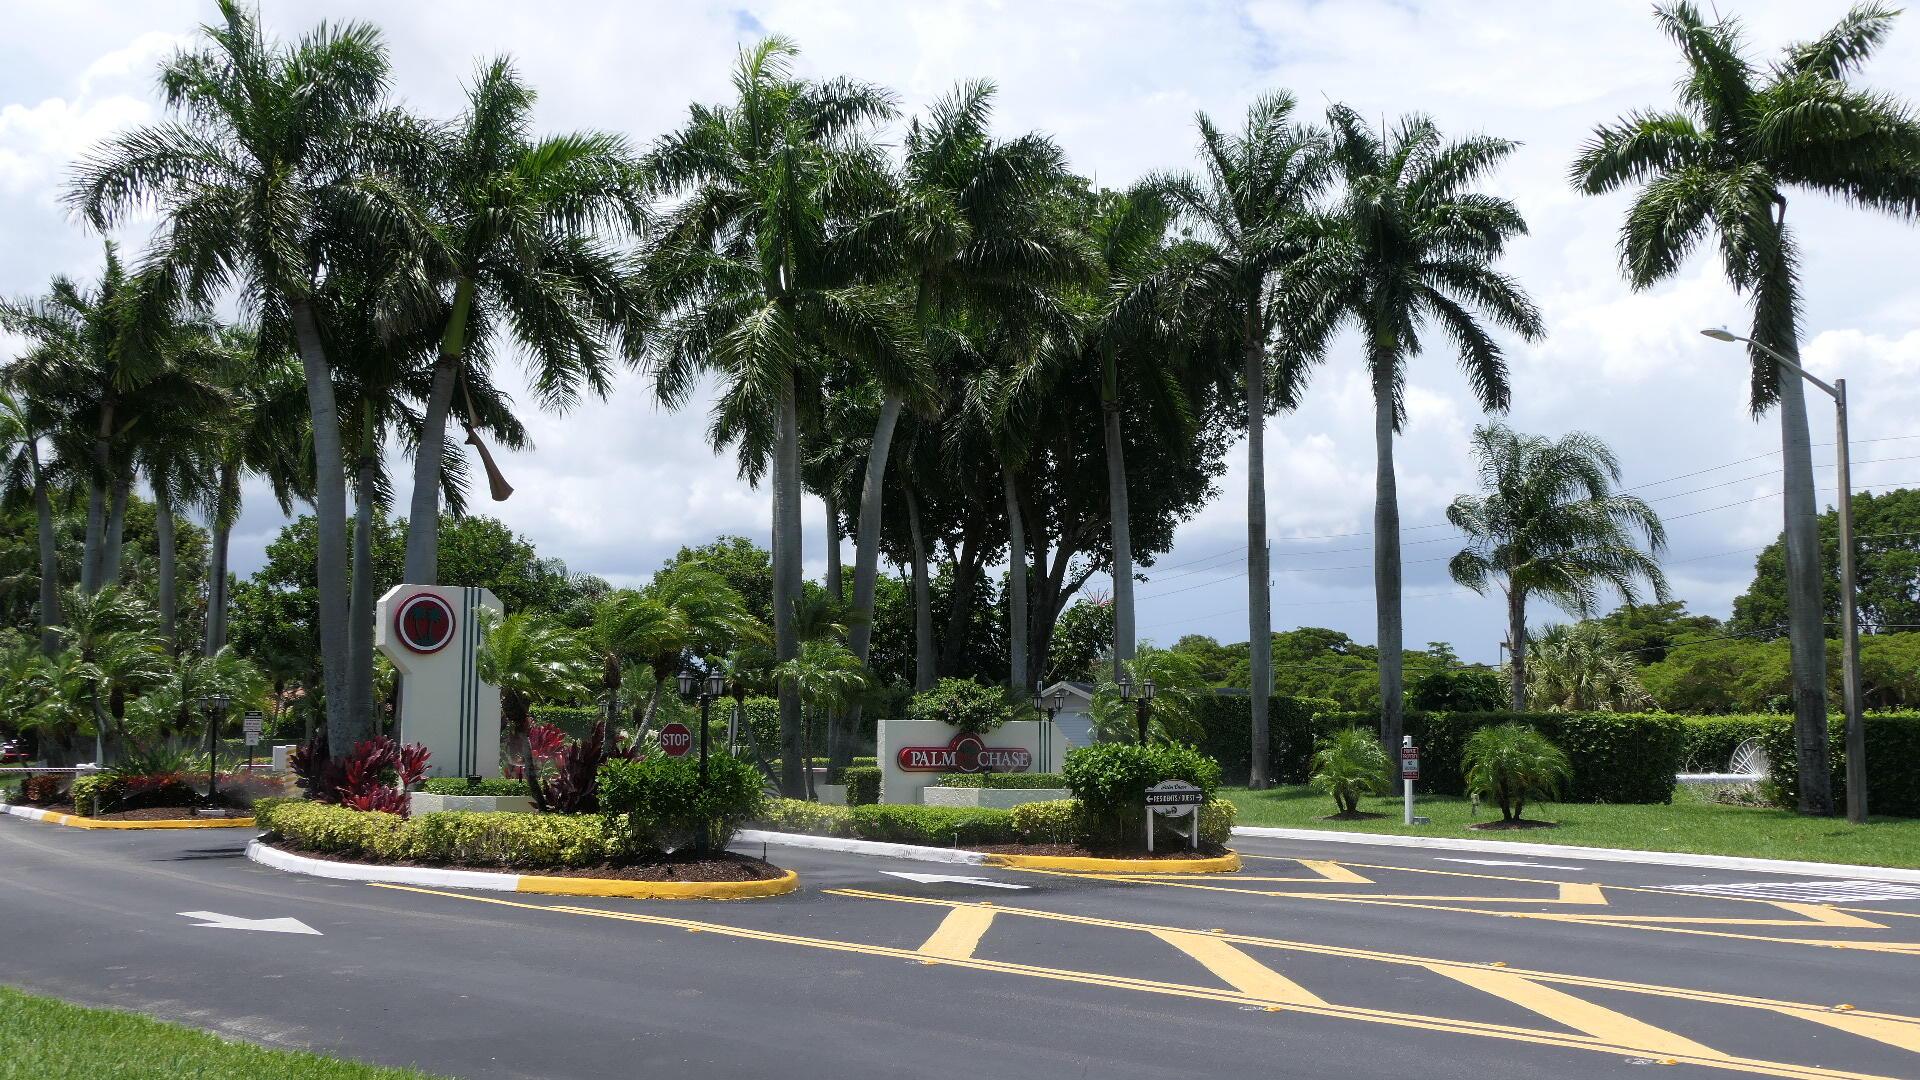 10977 Washingtonia Palm Court B Boynton Beach, FL 33437 photo 60